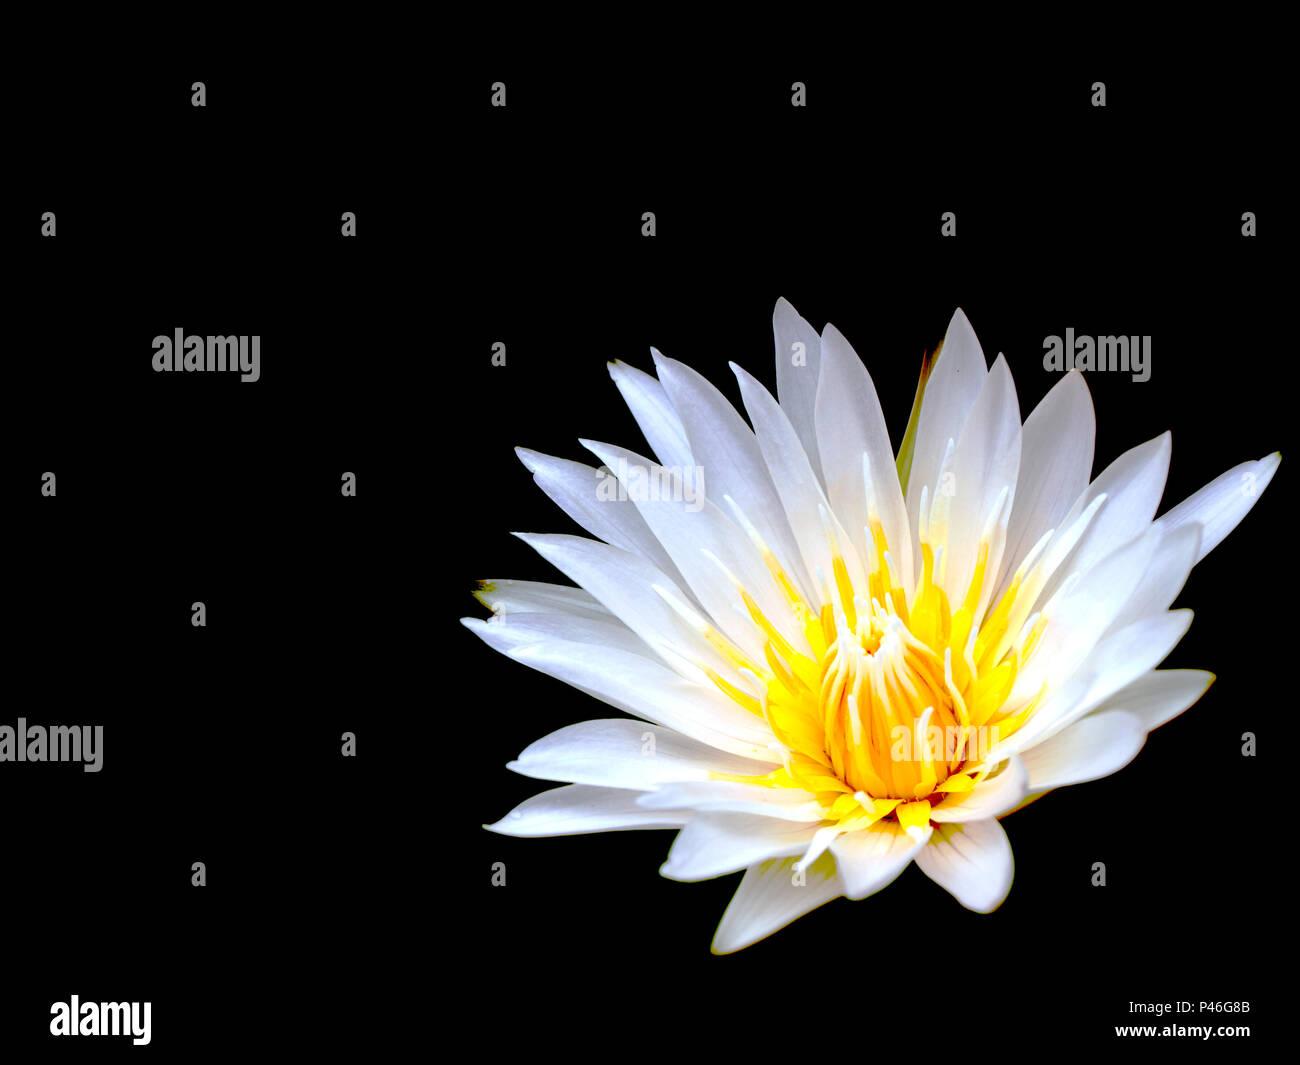 Beautiful White Lotus Flower Isolated On Black Background Stock